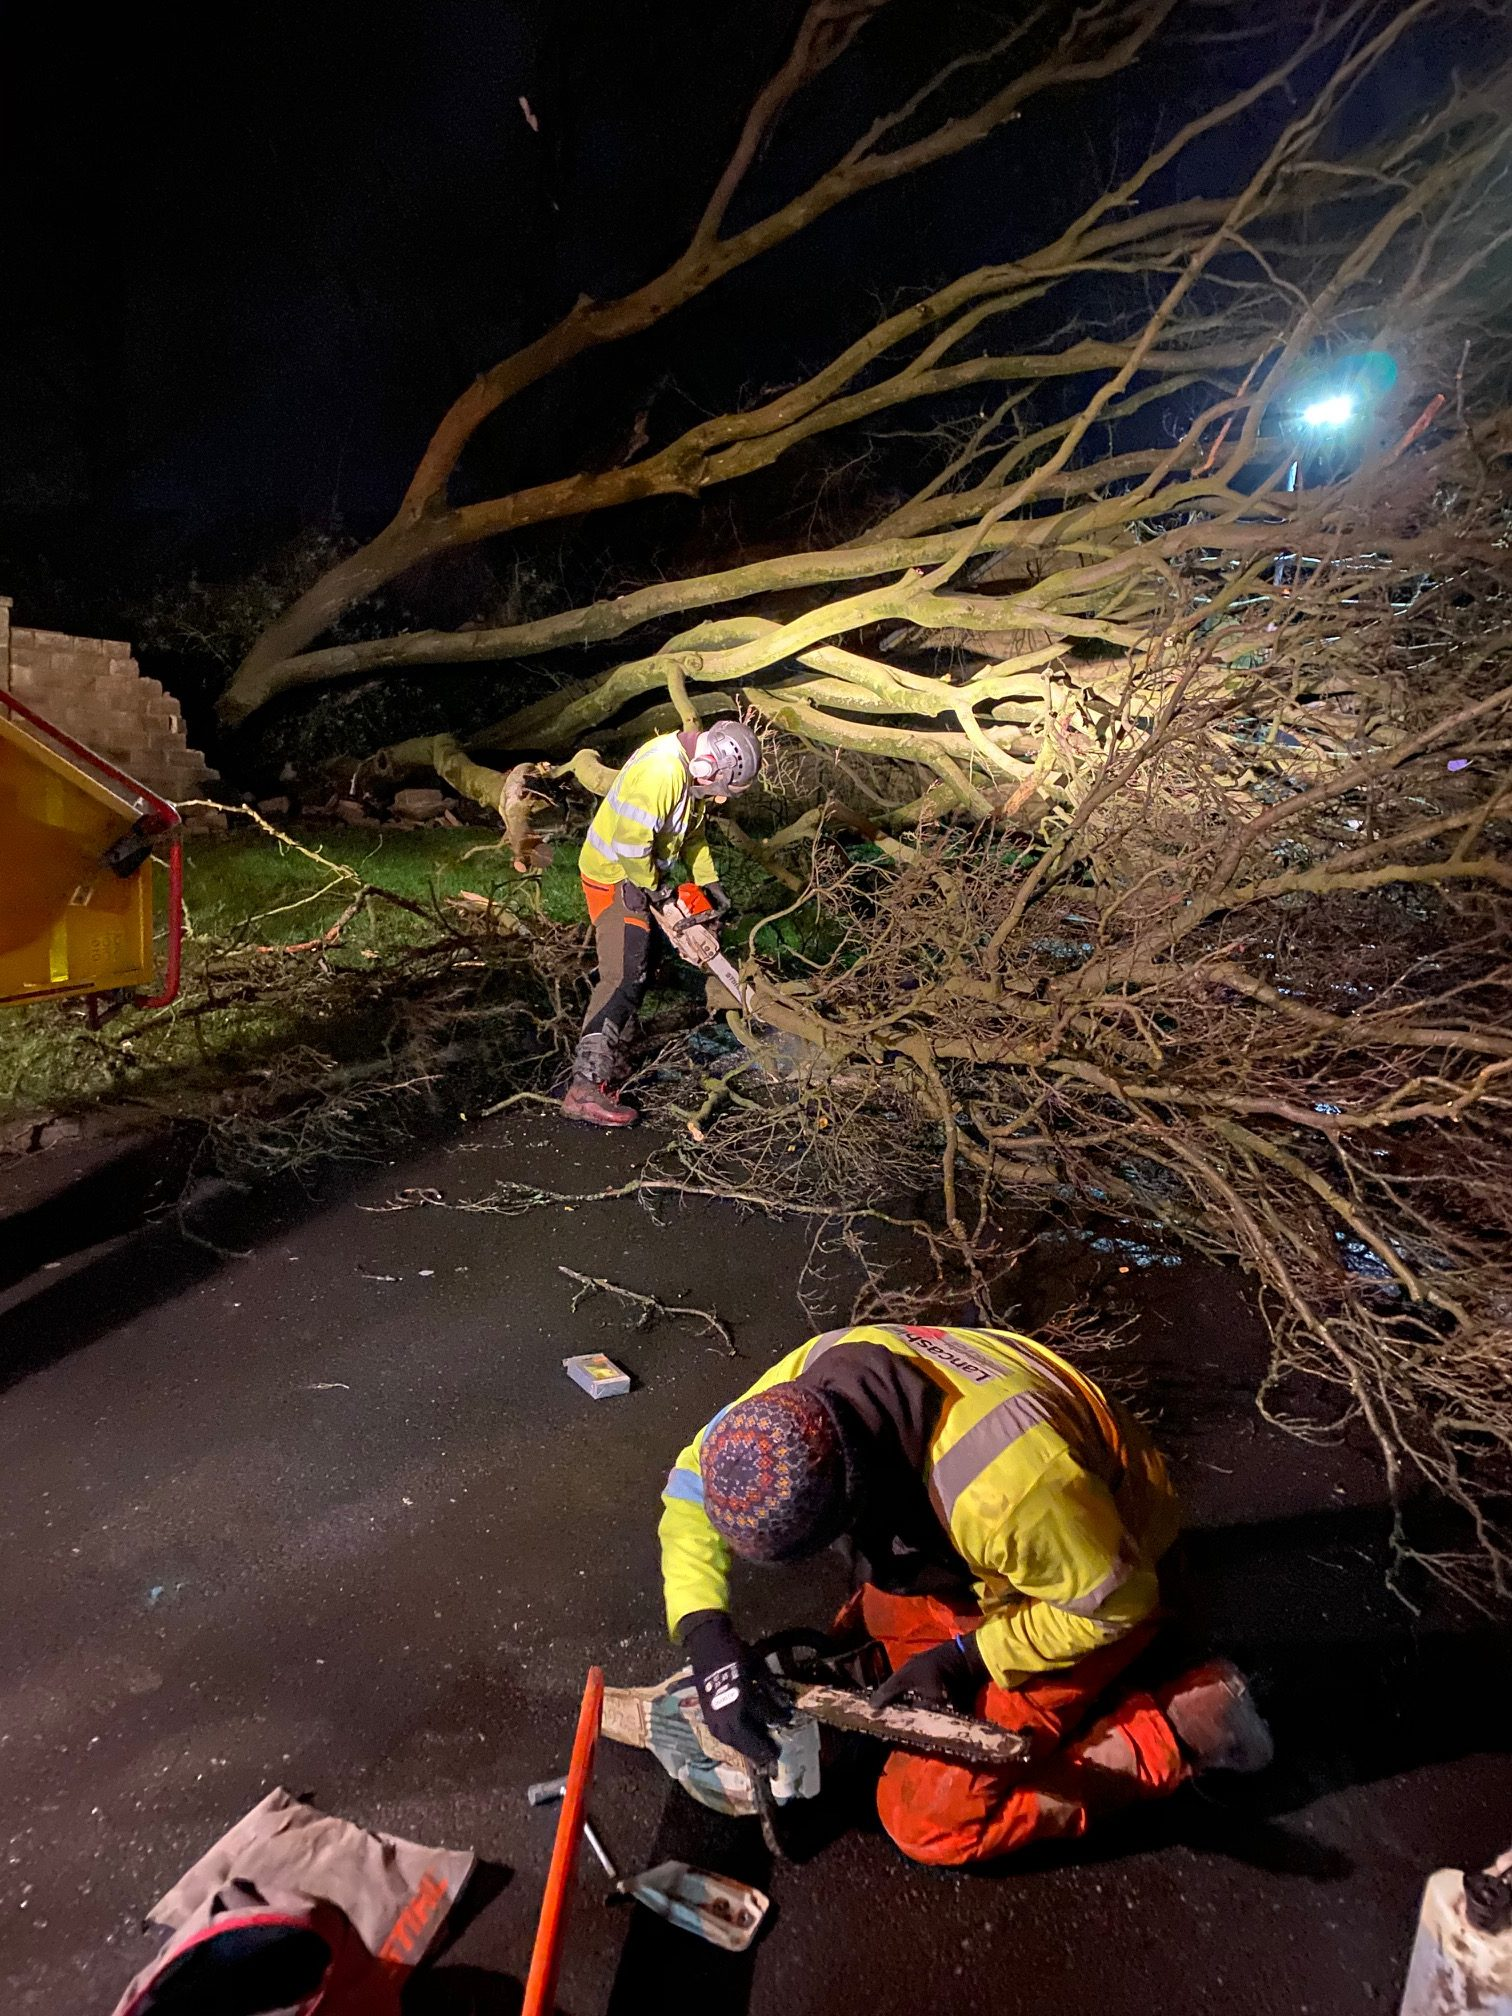 dennis, Big community effort helps to minimise impact of Storm Dennis, Skem News - The Top Source for Skelmersdale News, Skem News - The Top Source for Skelmersdale News